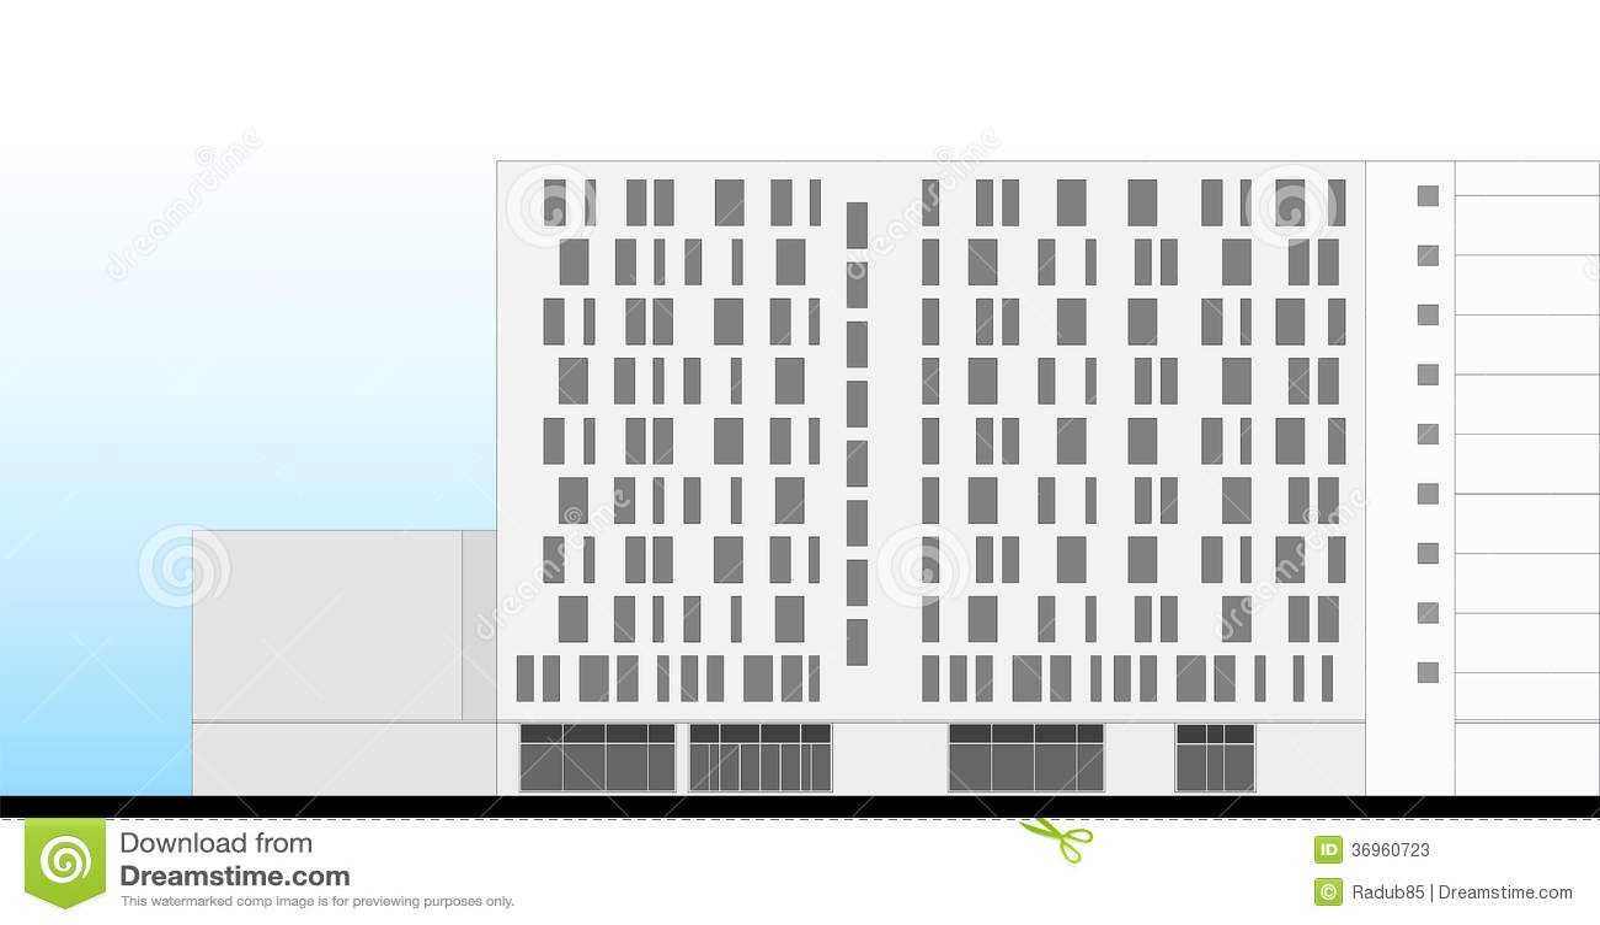 Fassade modern hotel  Hotel-Gebäude-Fassaden-Architekturplan Stockfotos - Bild: 36960723